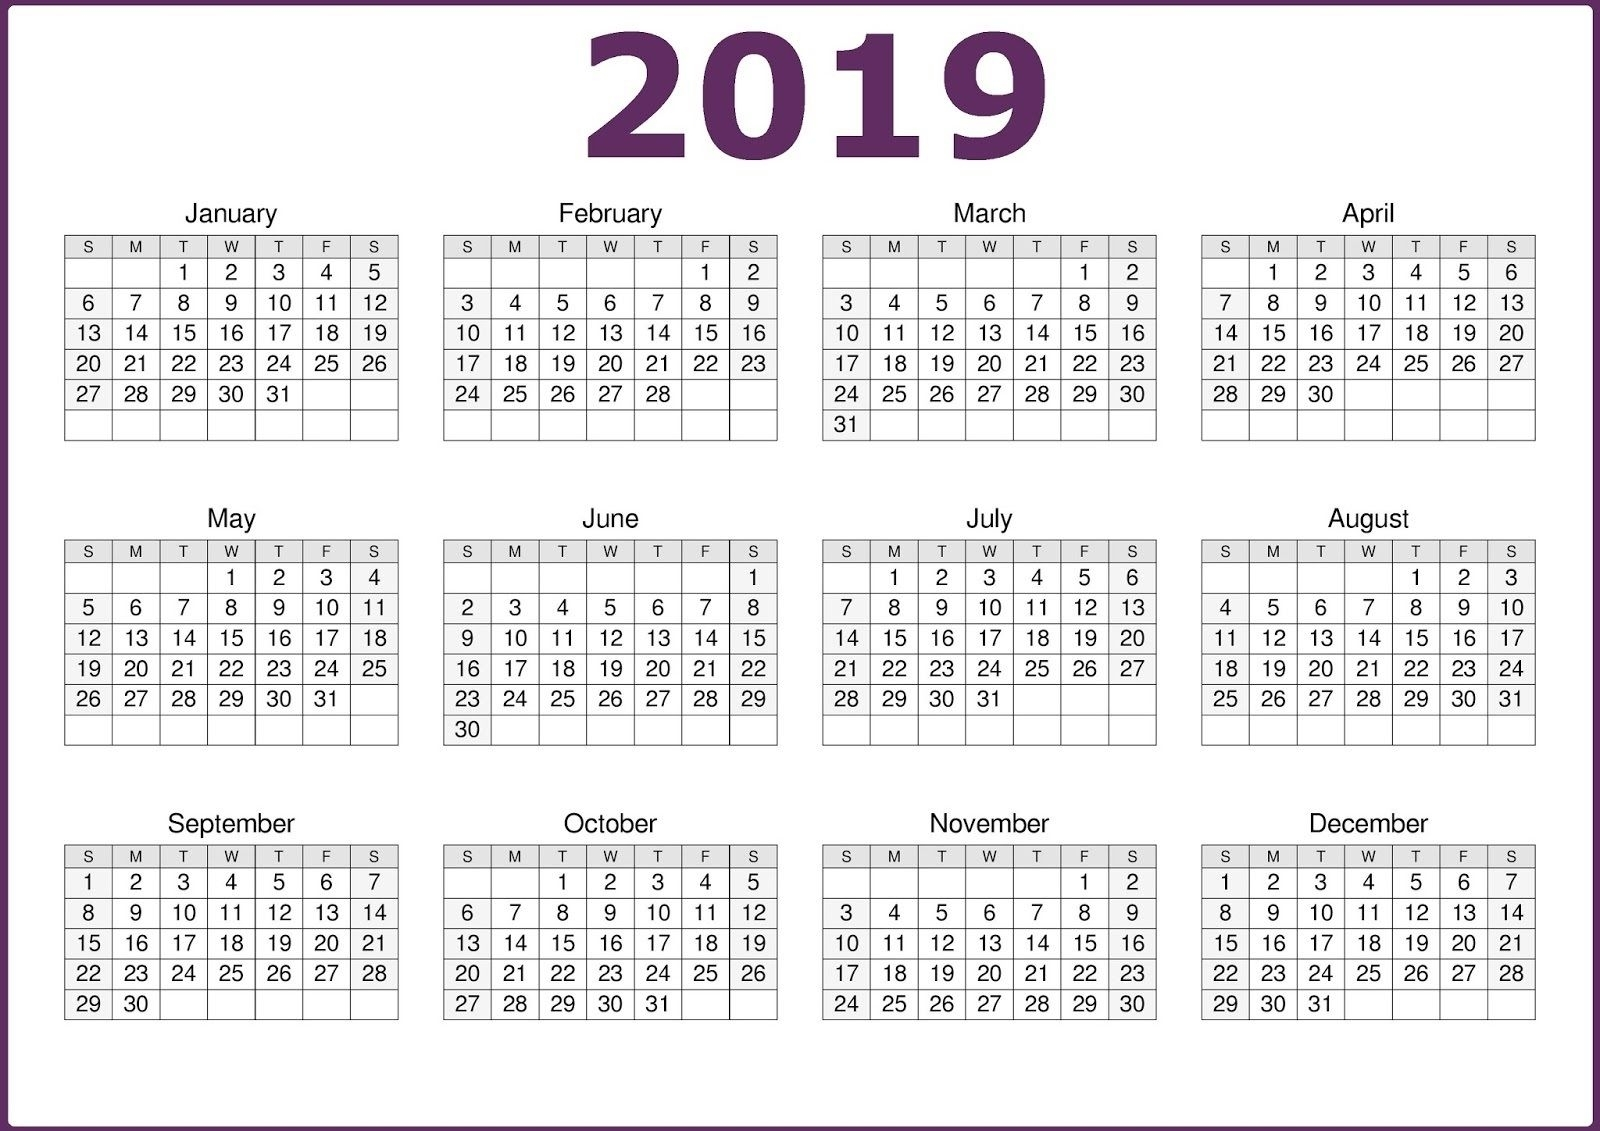 2019 One Page 12 Months Calendar   2019 Calendars regarding 12 Month Calendar On One Page